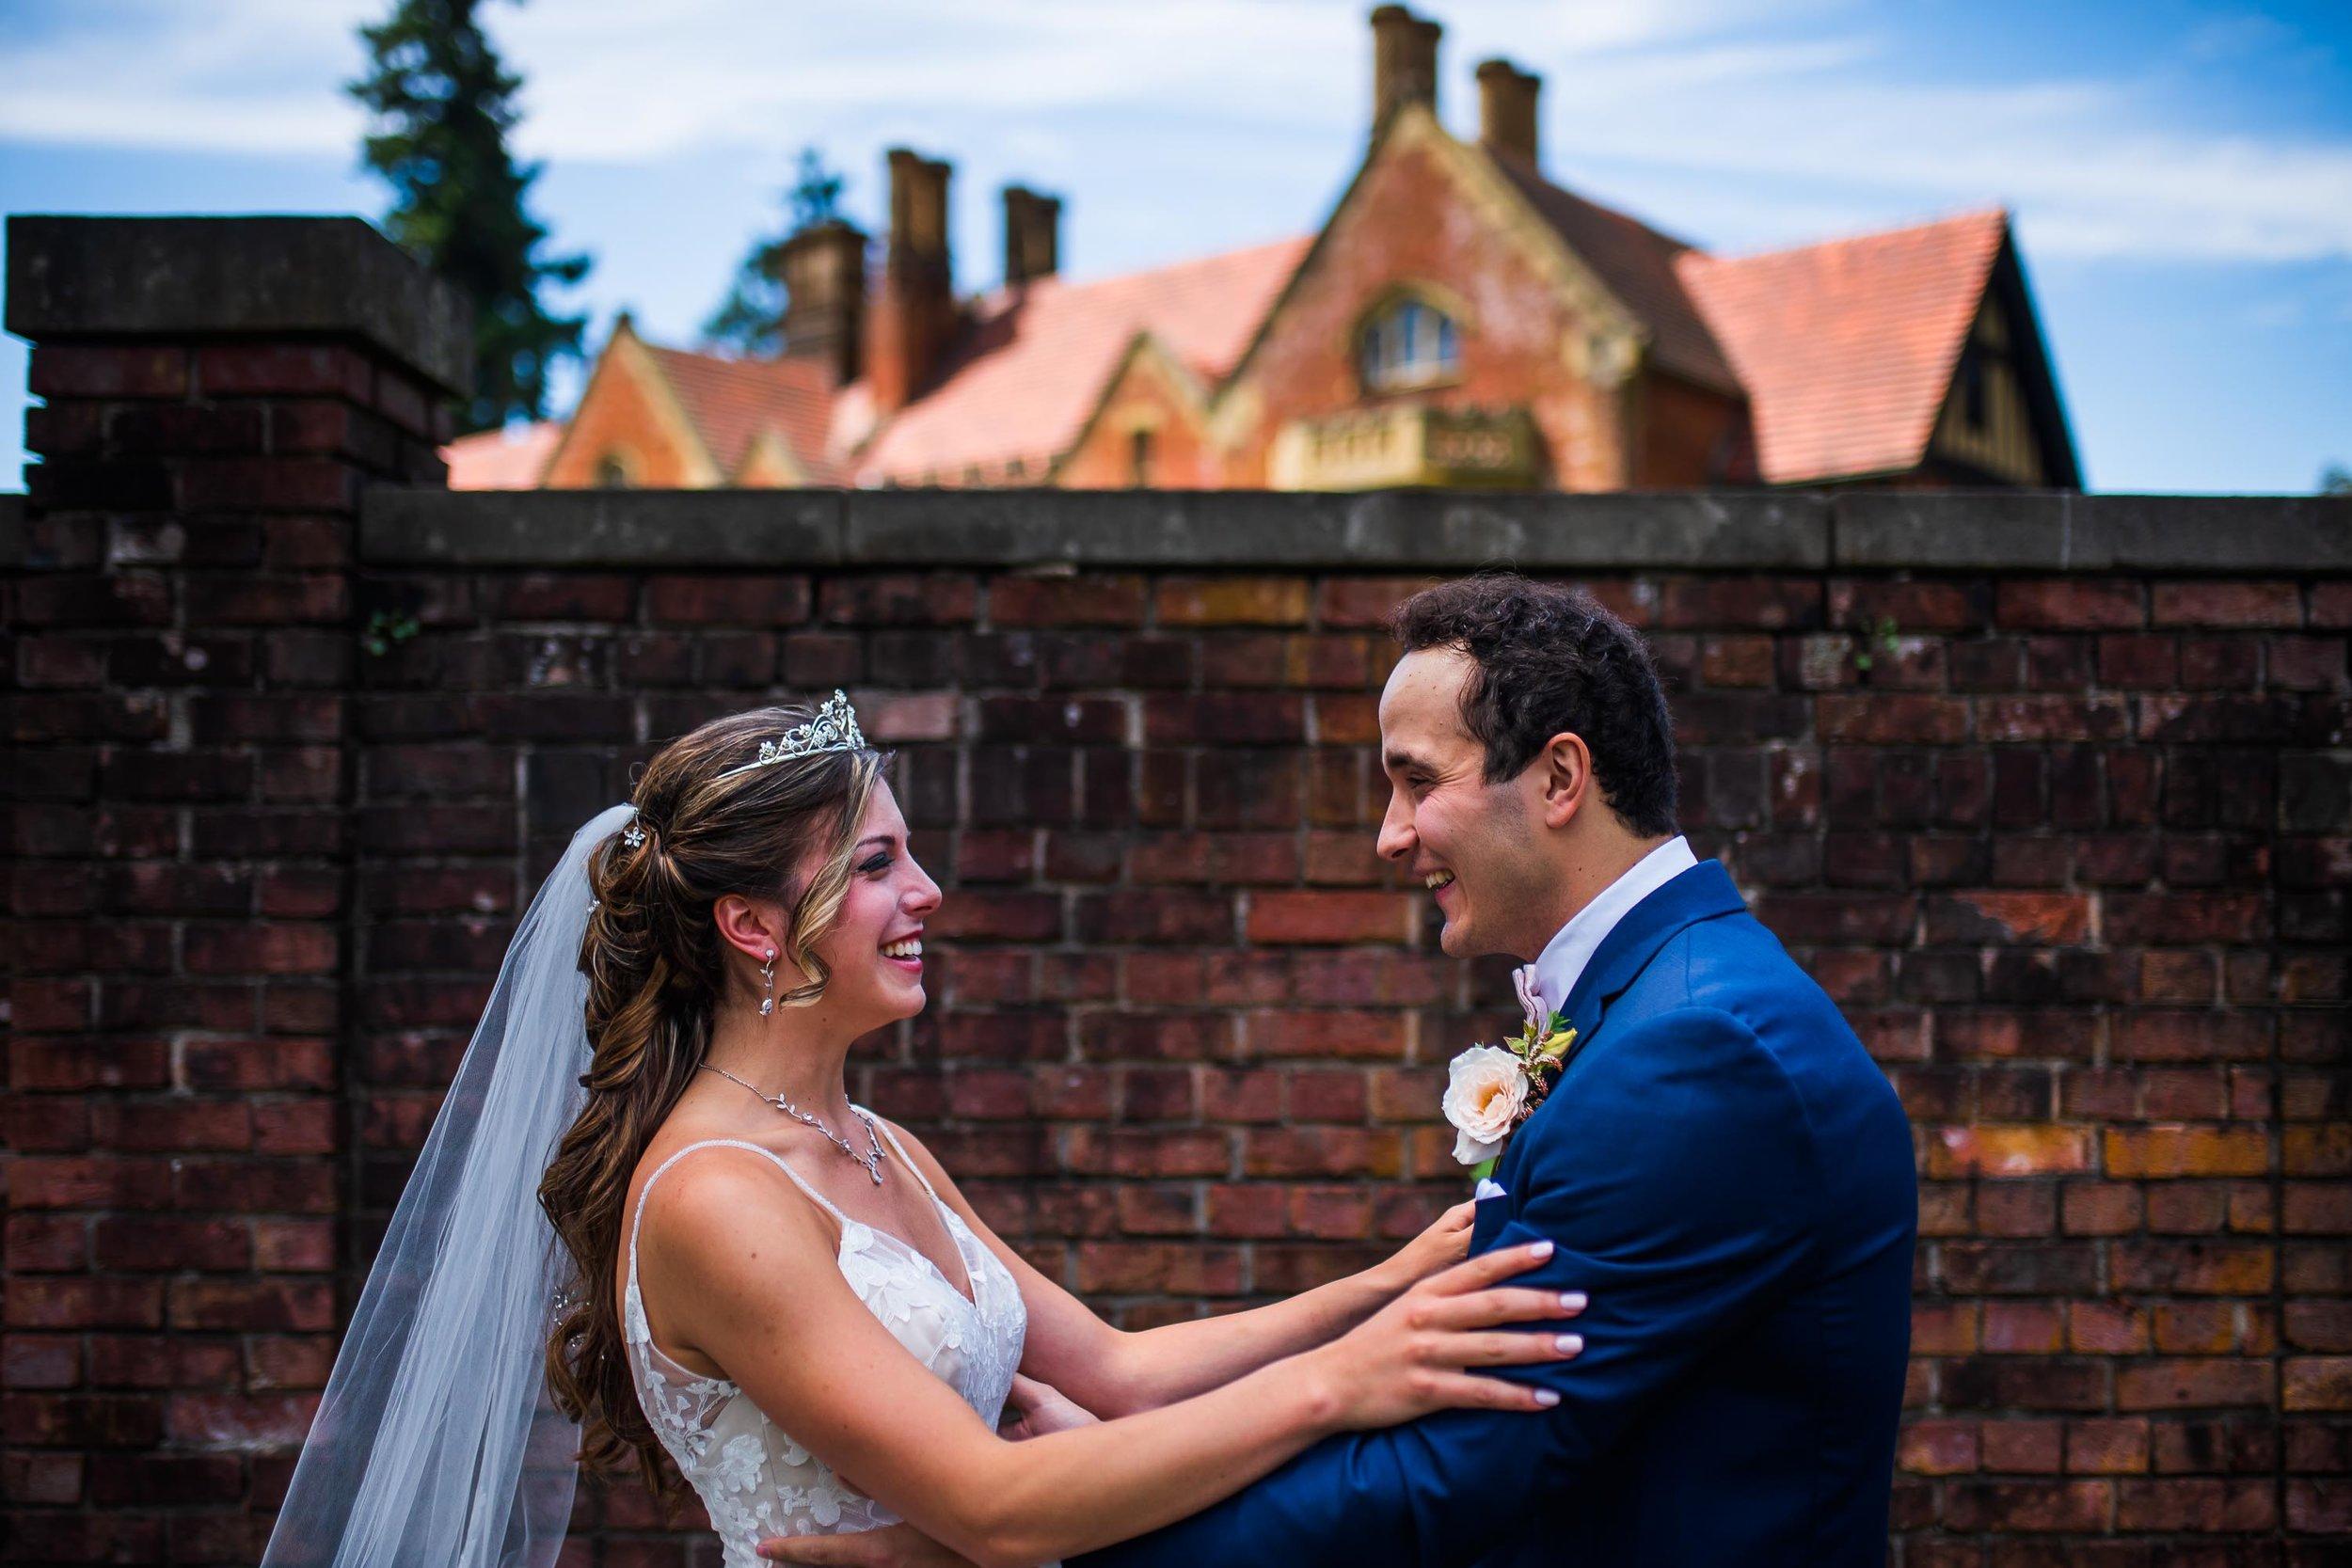 thornewood castle wedding 17.jpg